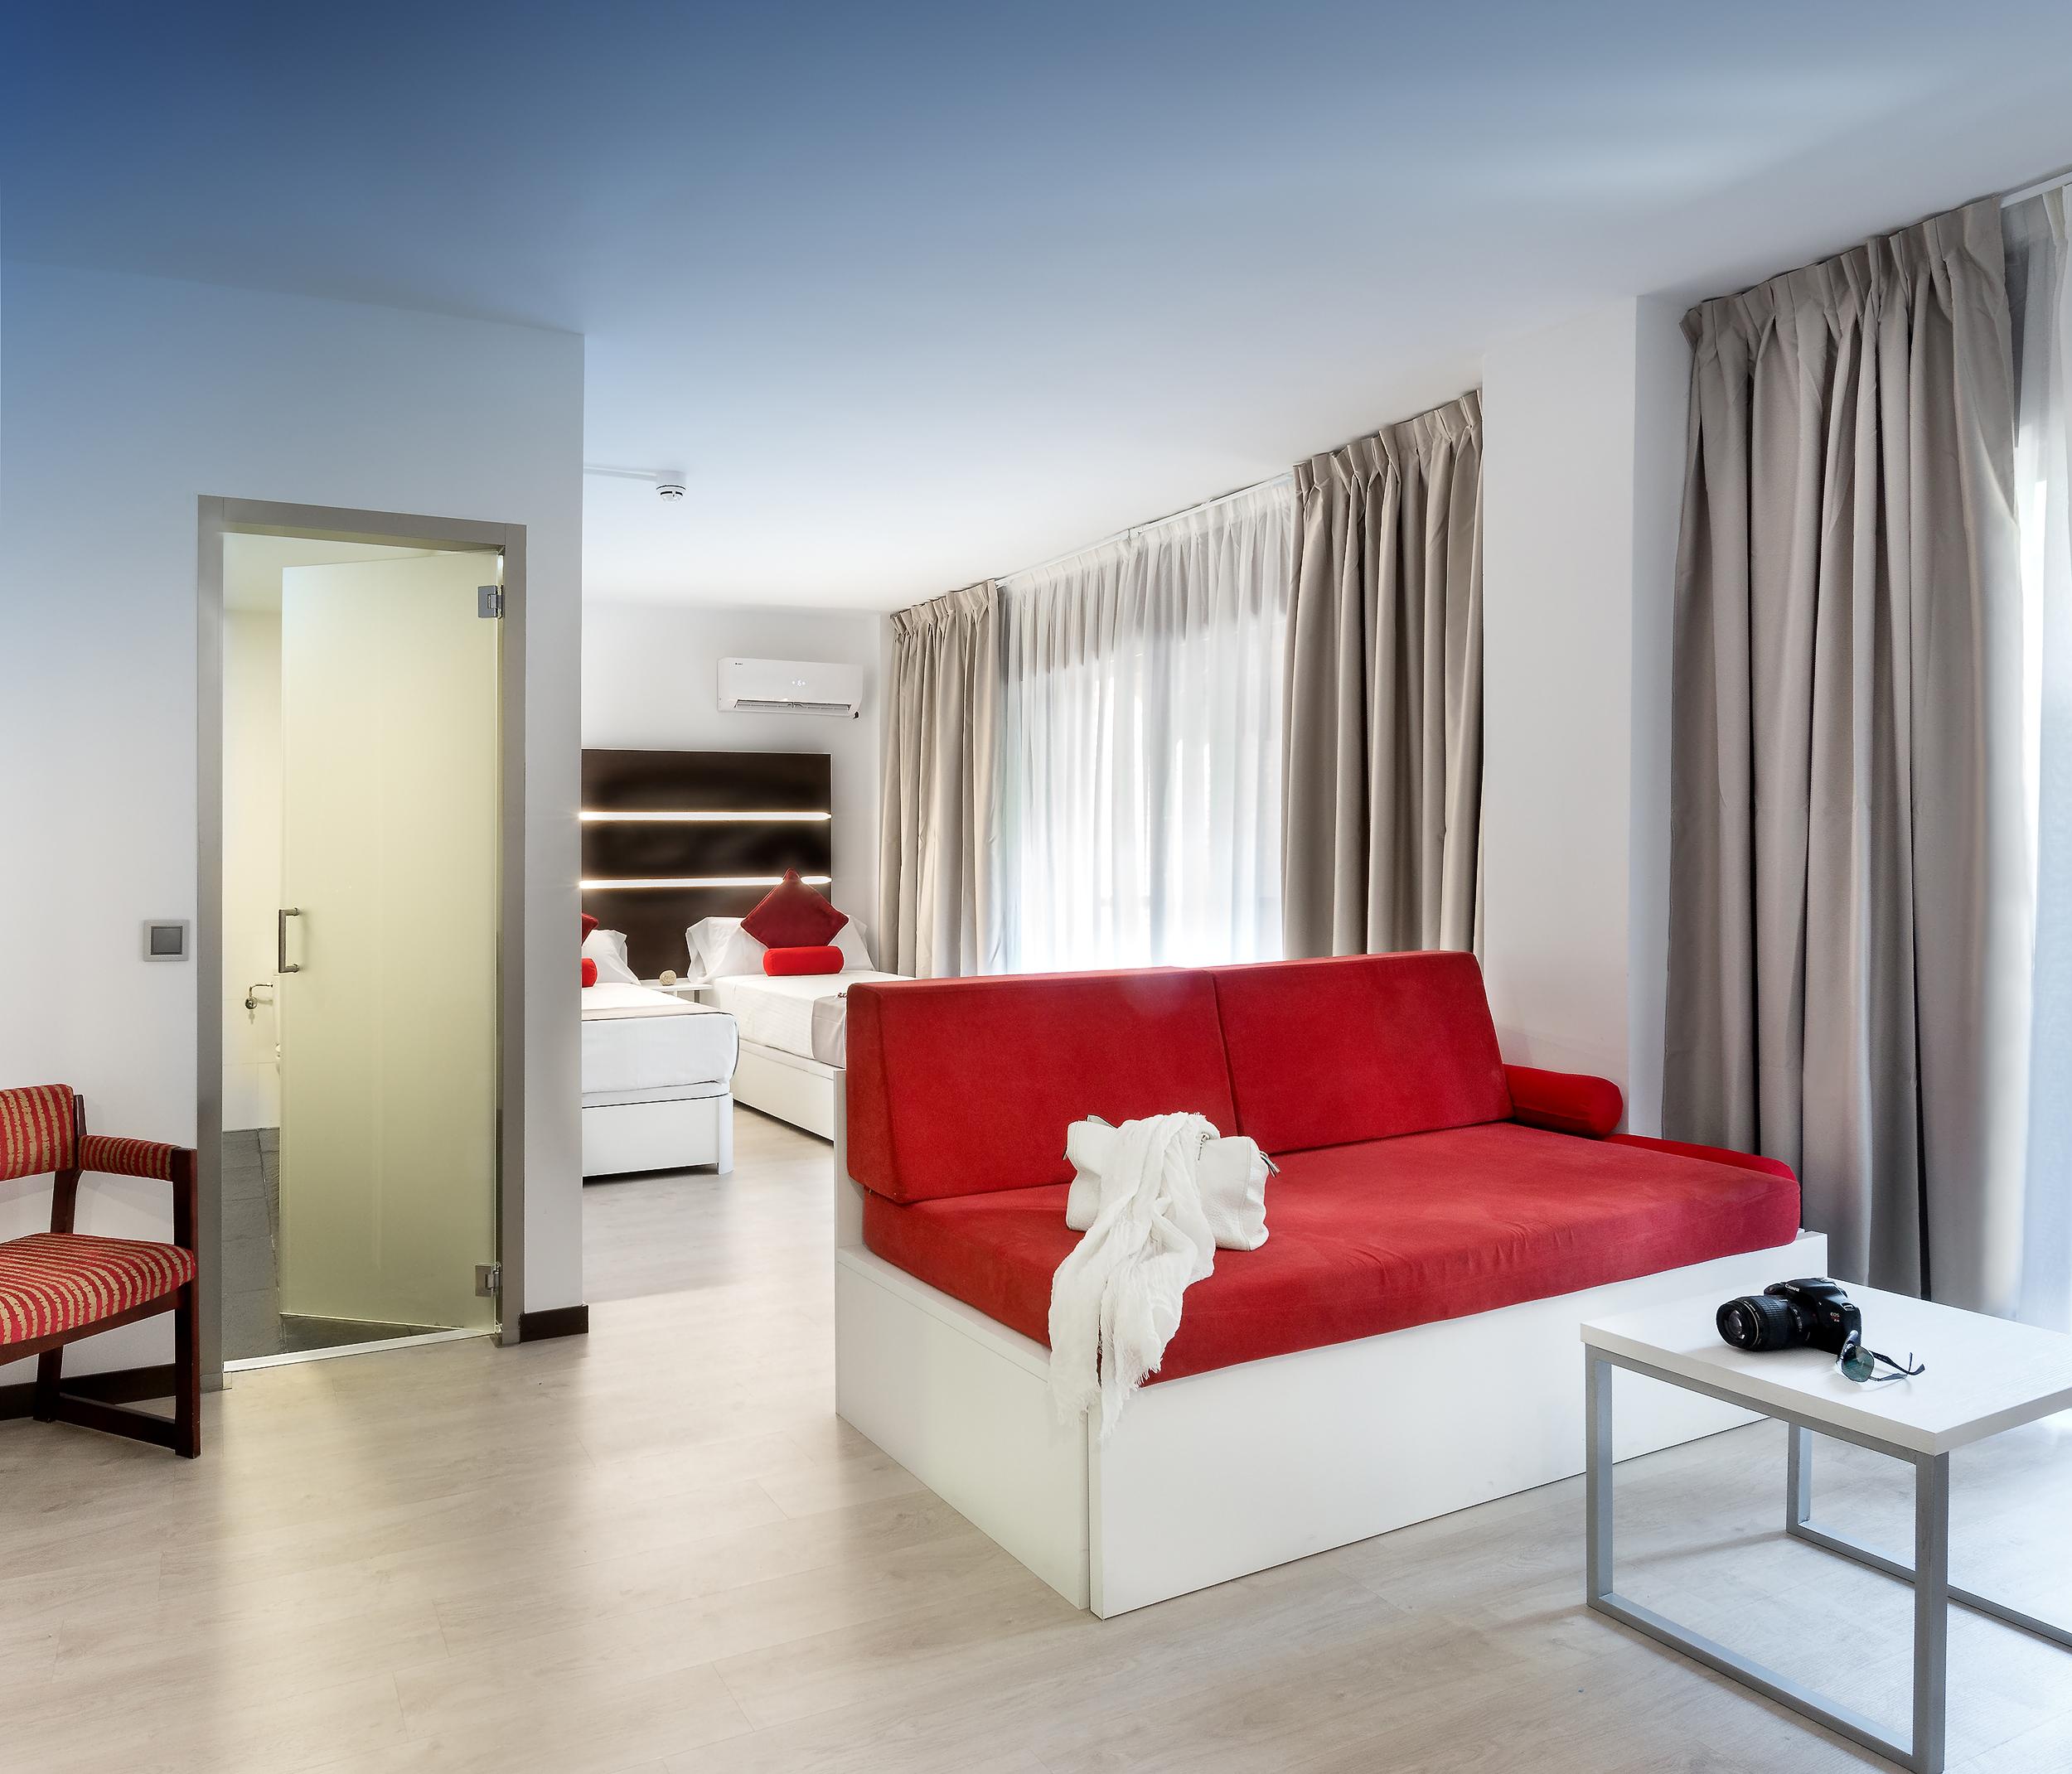 HOSTAL habitacion suites.